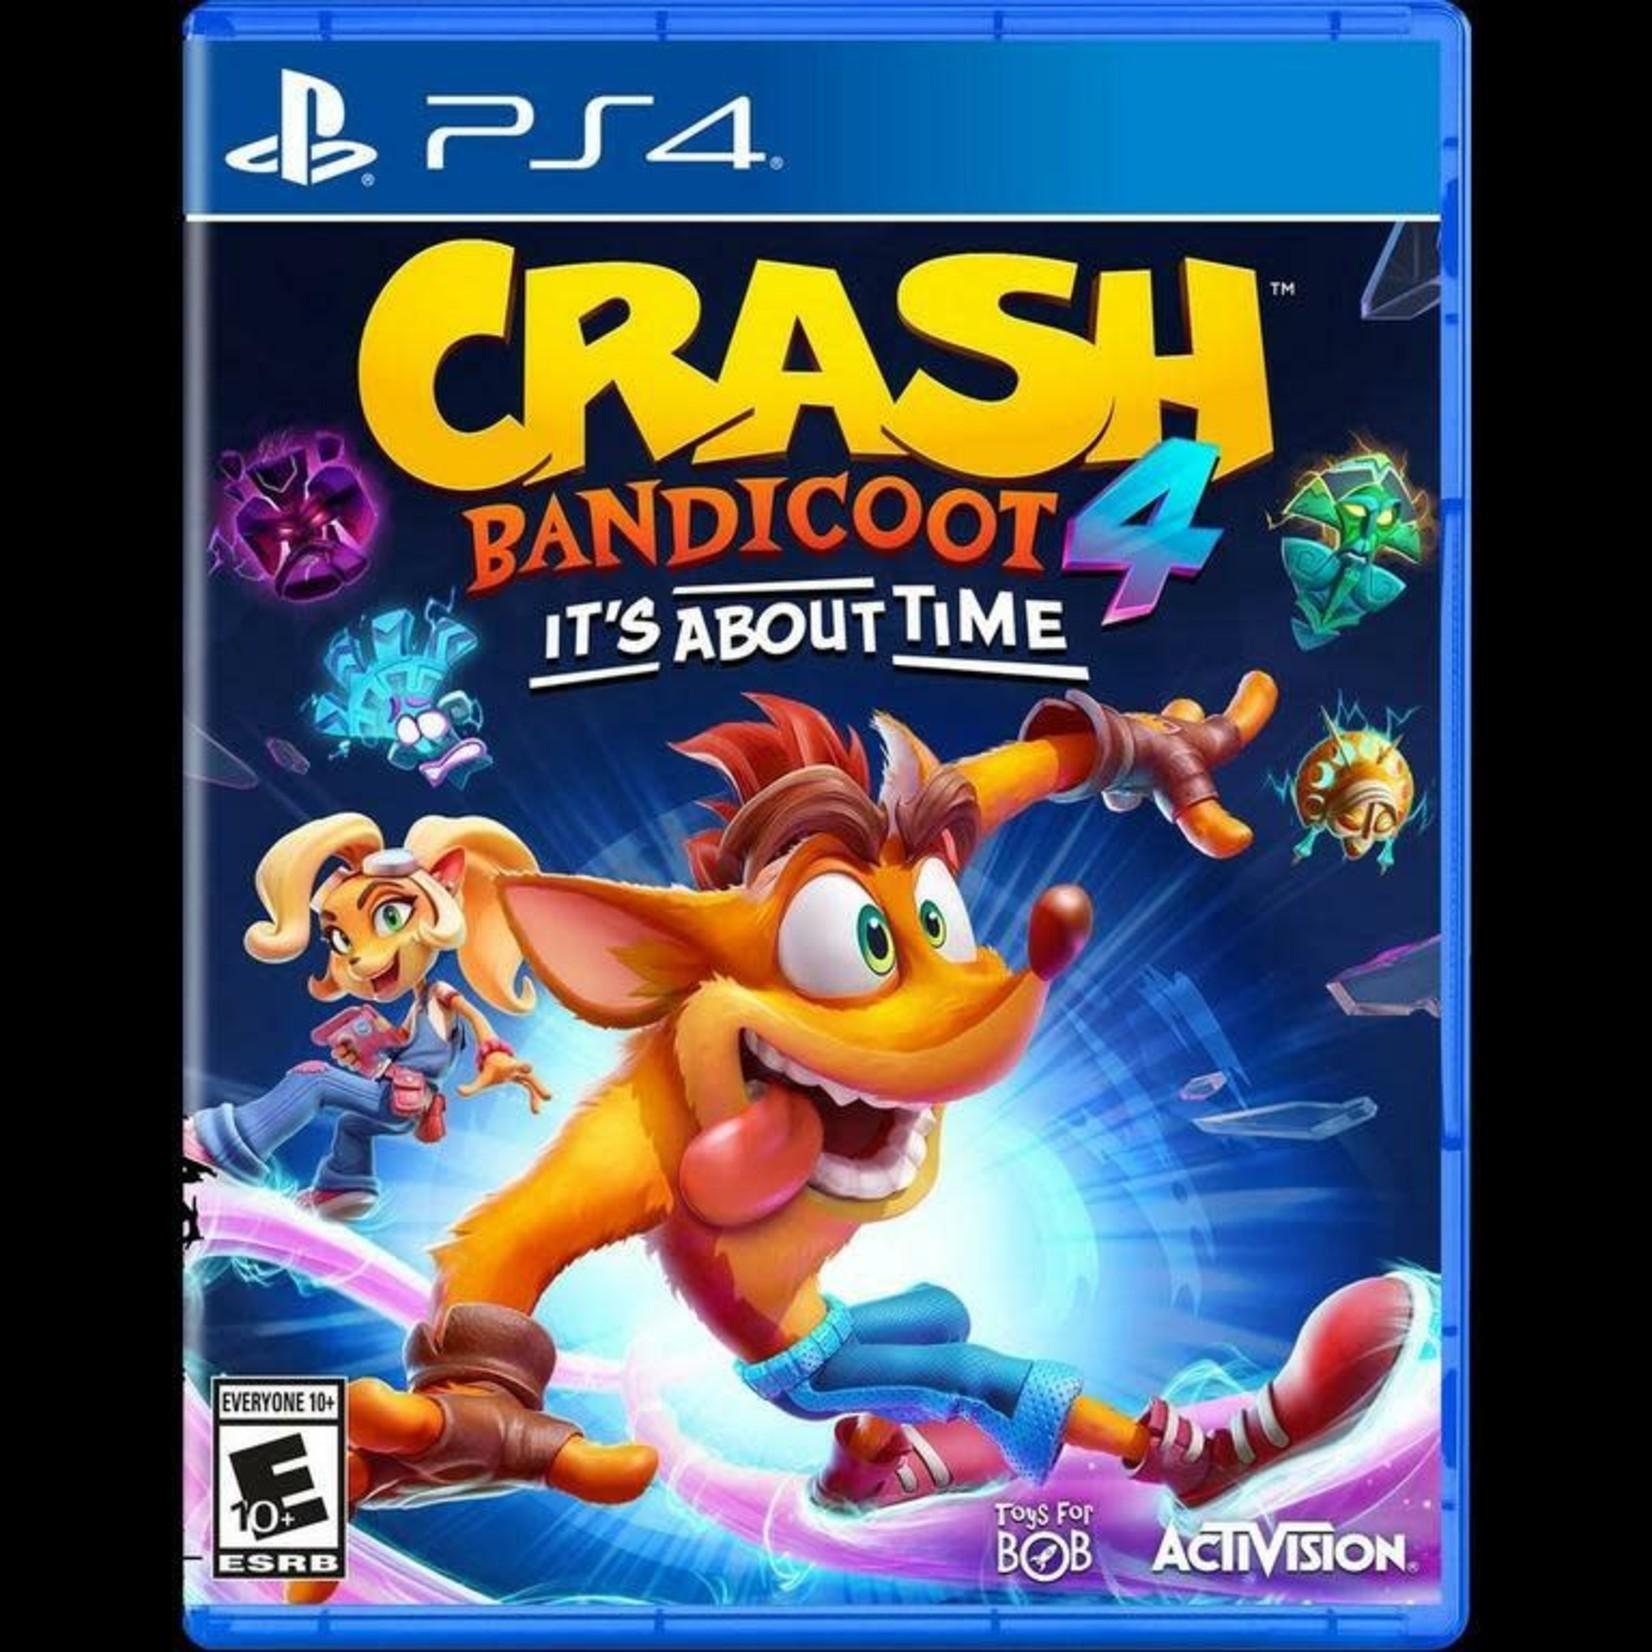 PS4-Crash Bandicoot 4: It's About Time